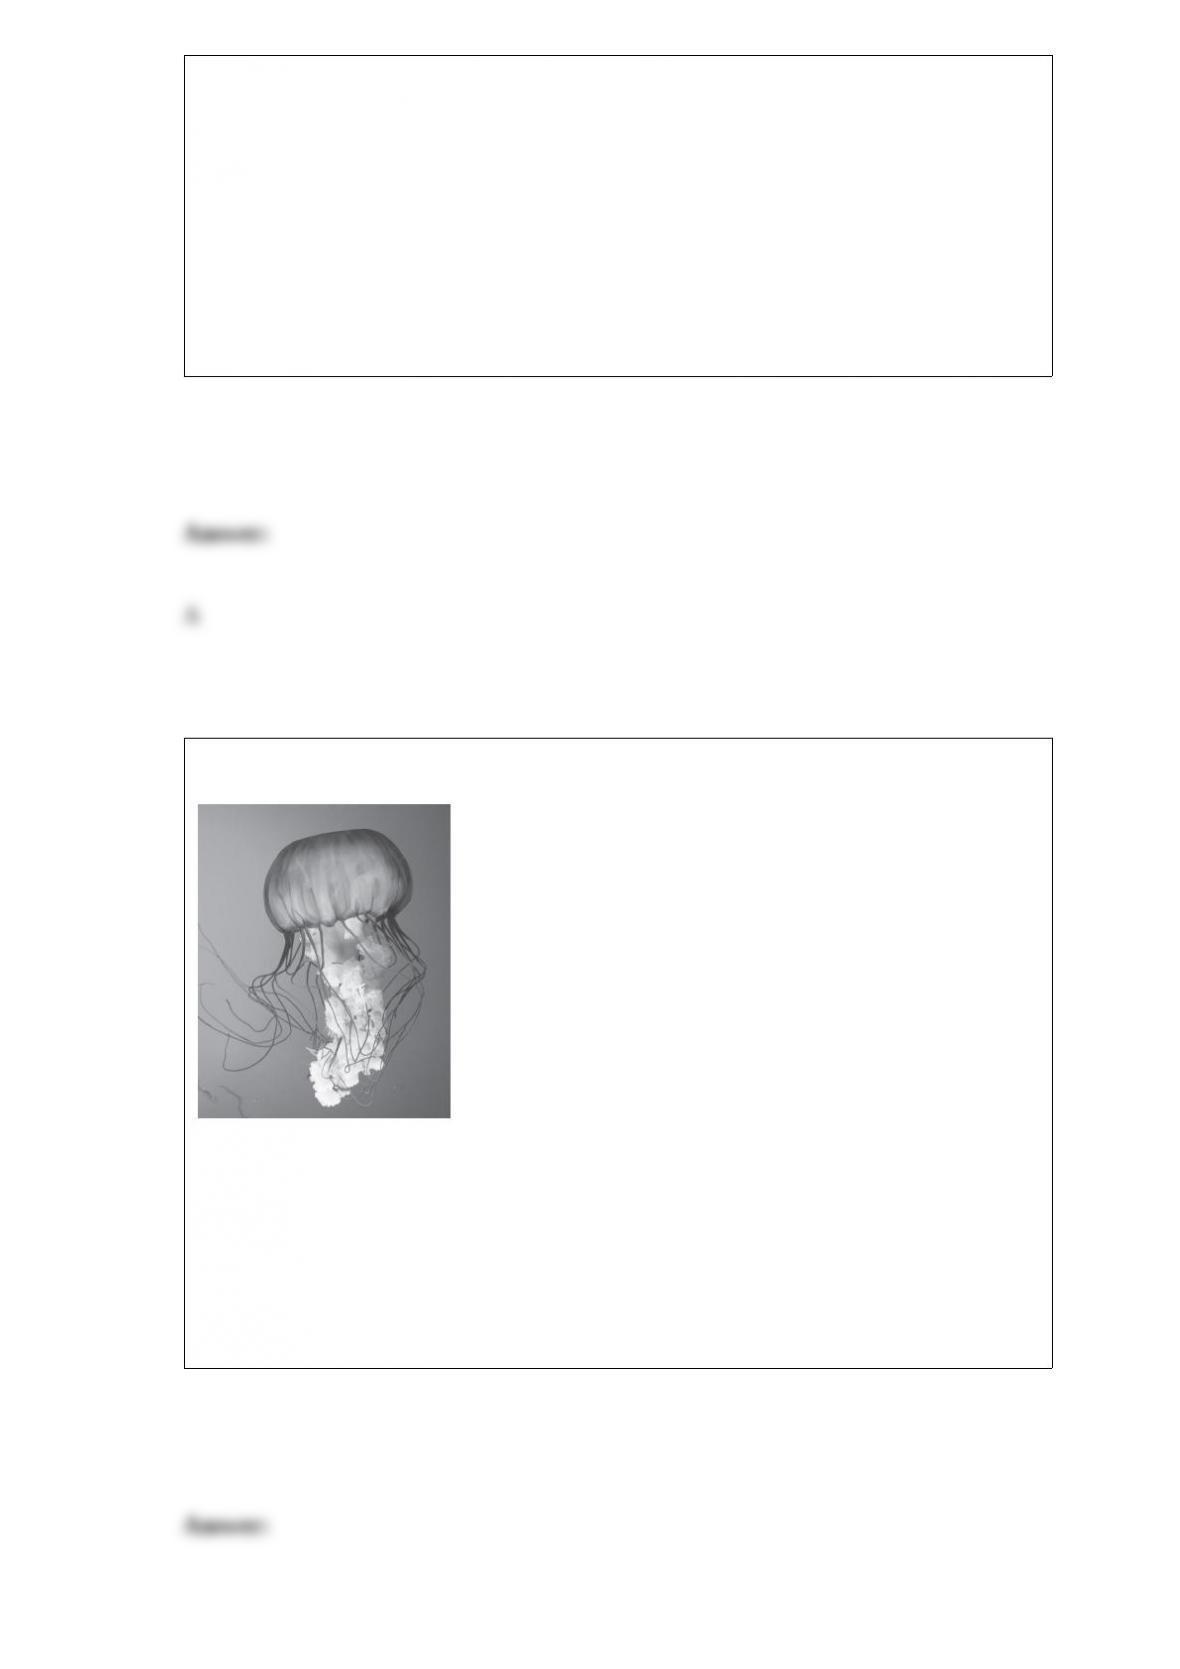 BIOL Coursepaper